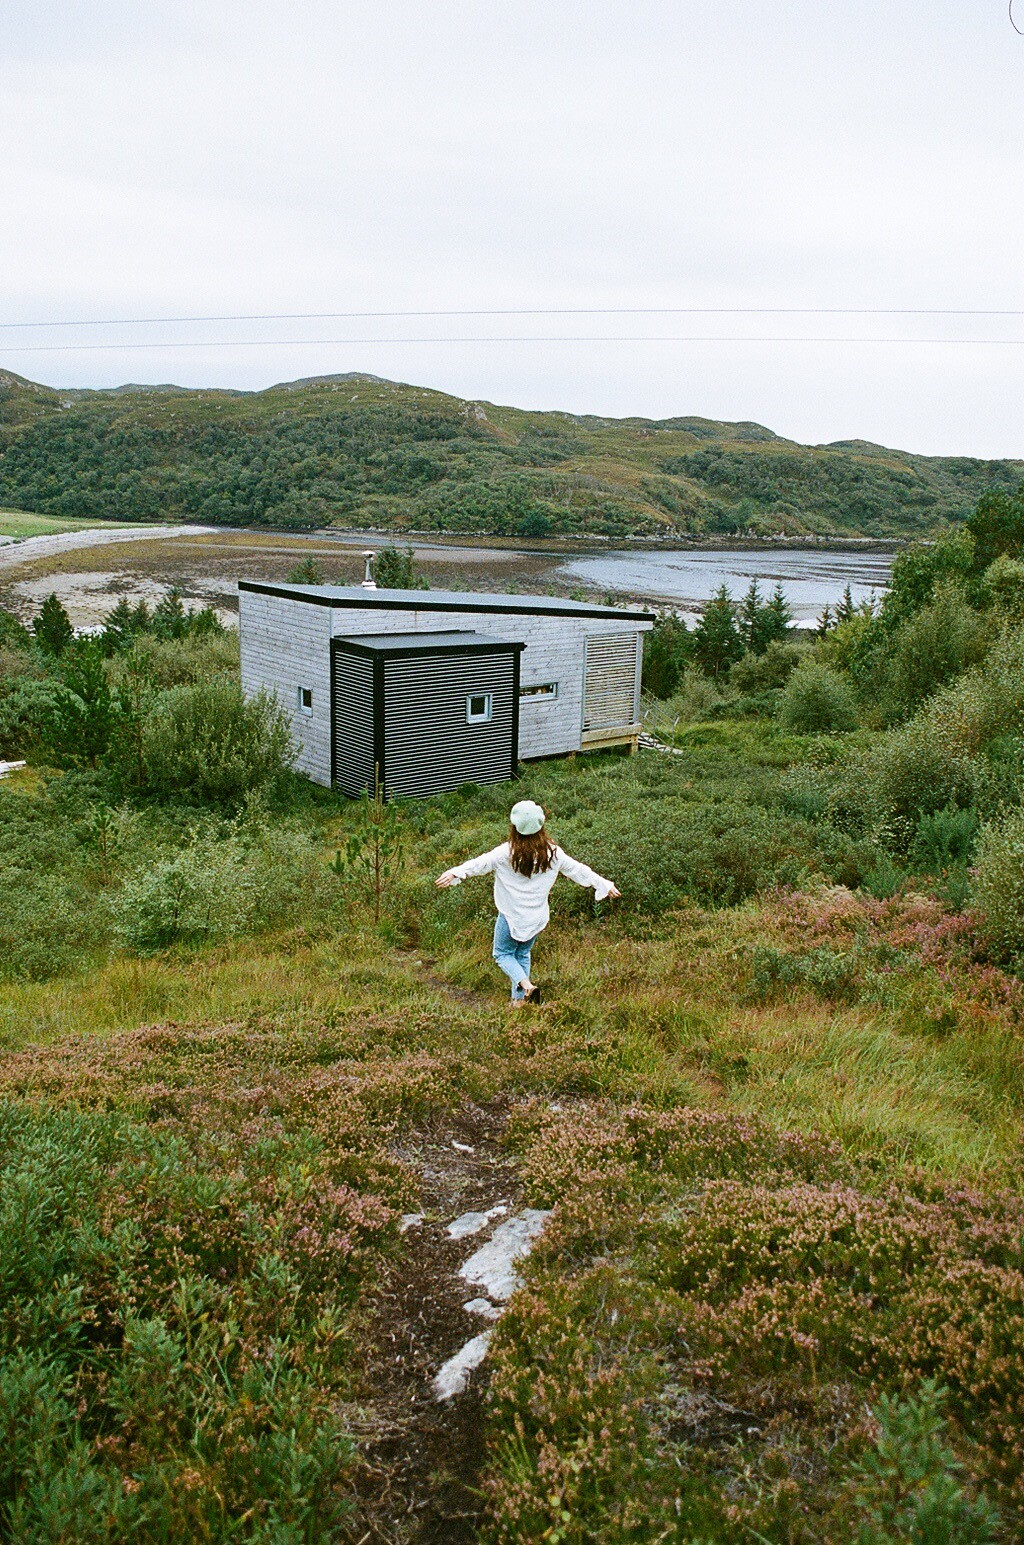 The Little Magpie Scotland Photo Diary North Coast 500 10